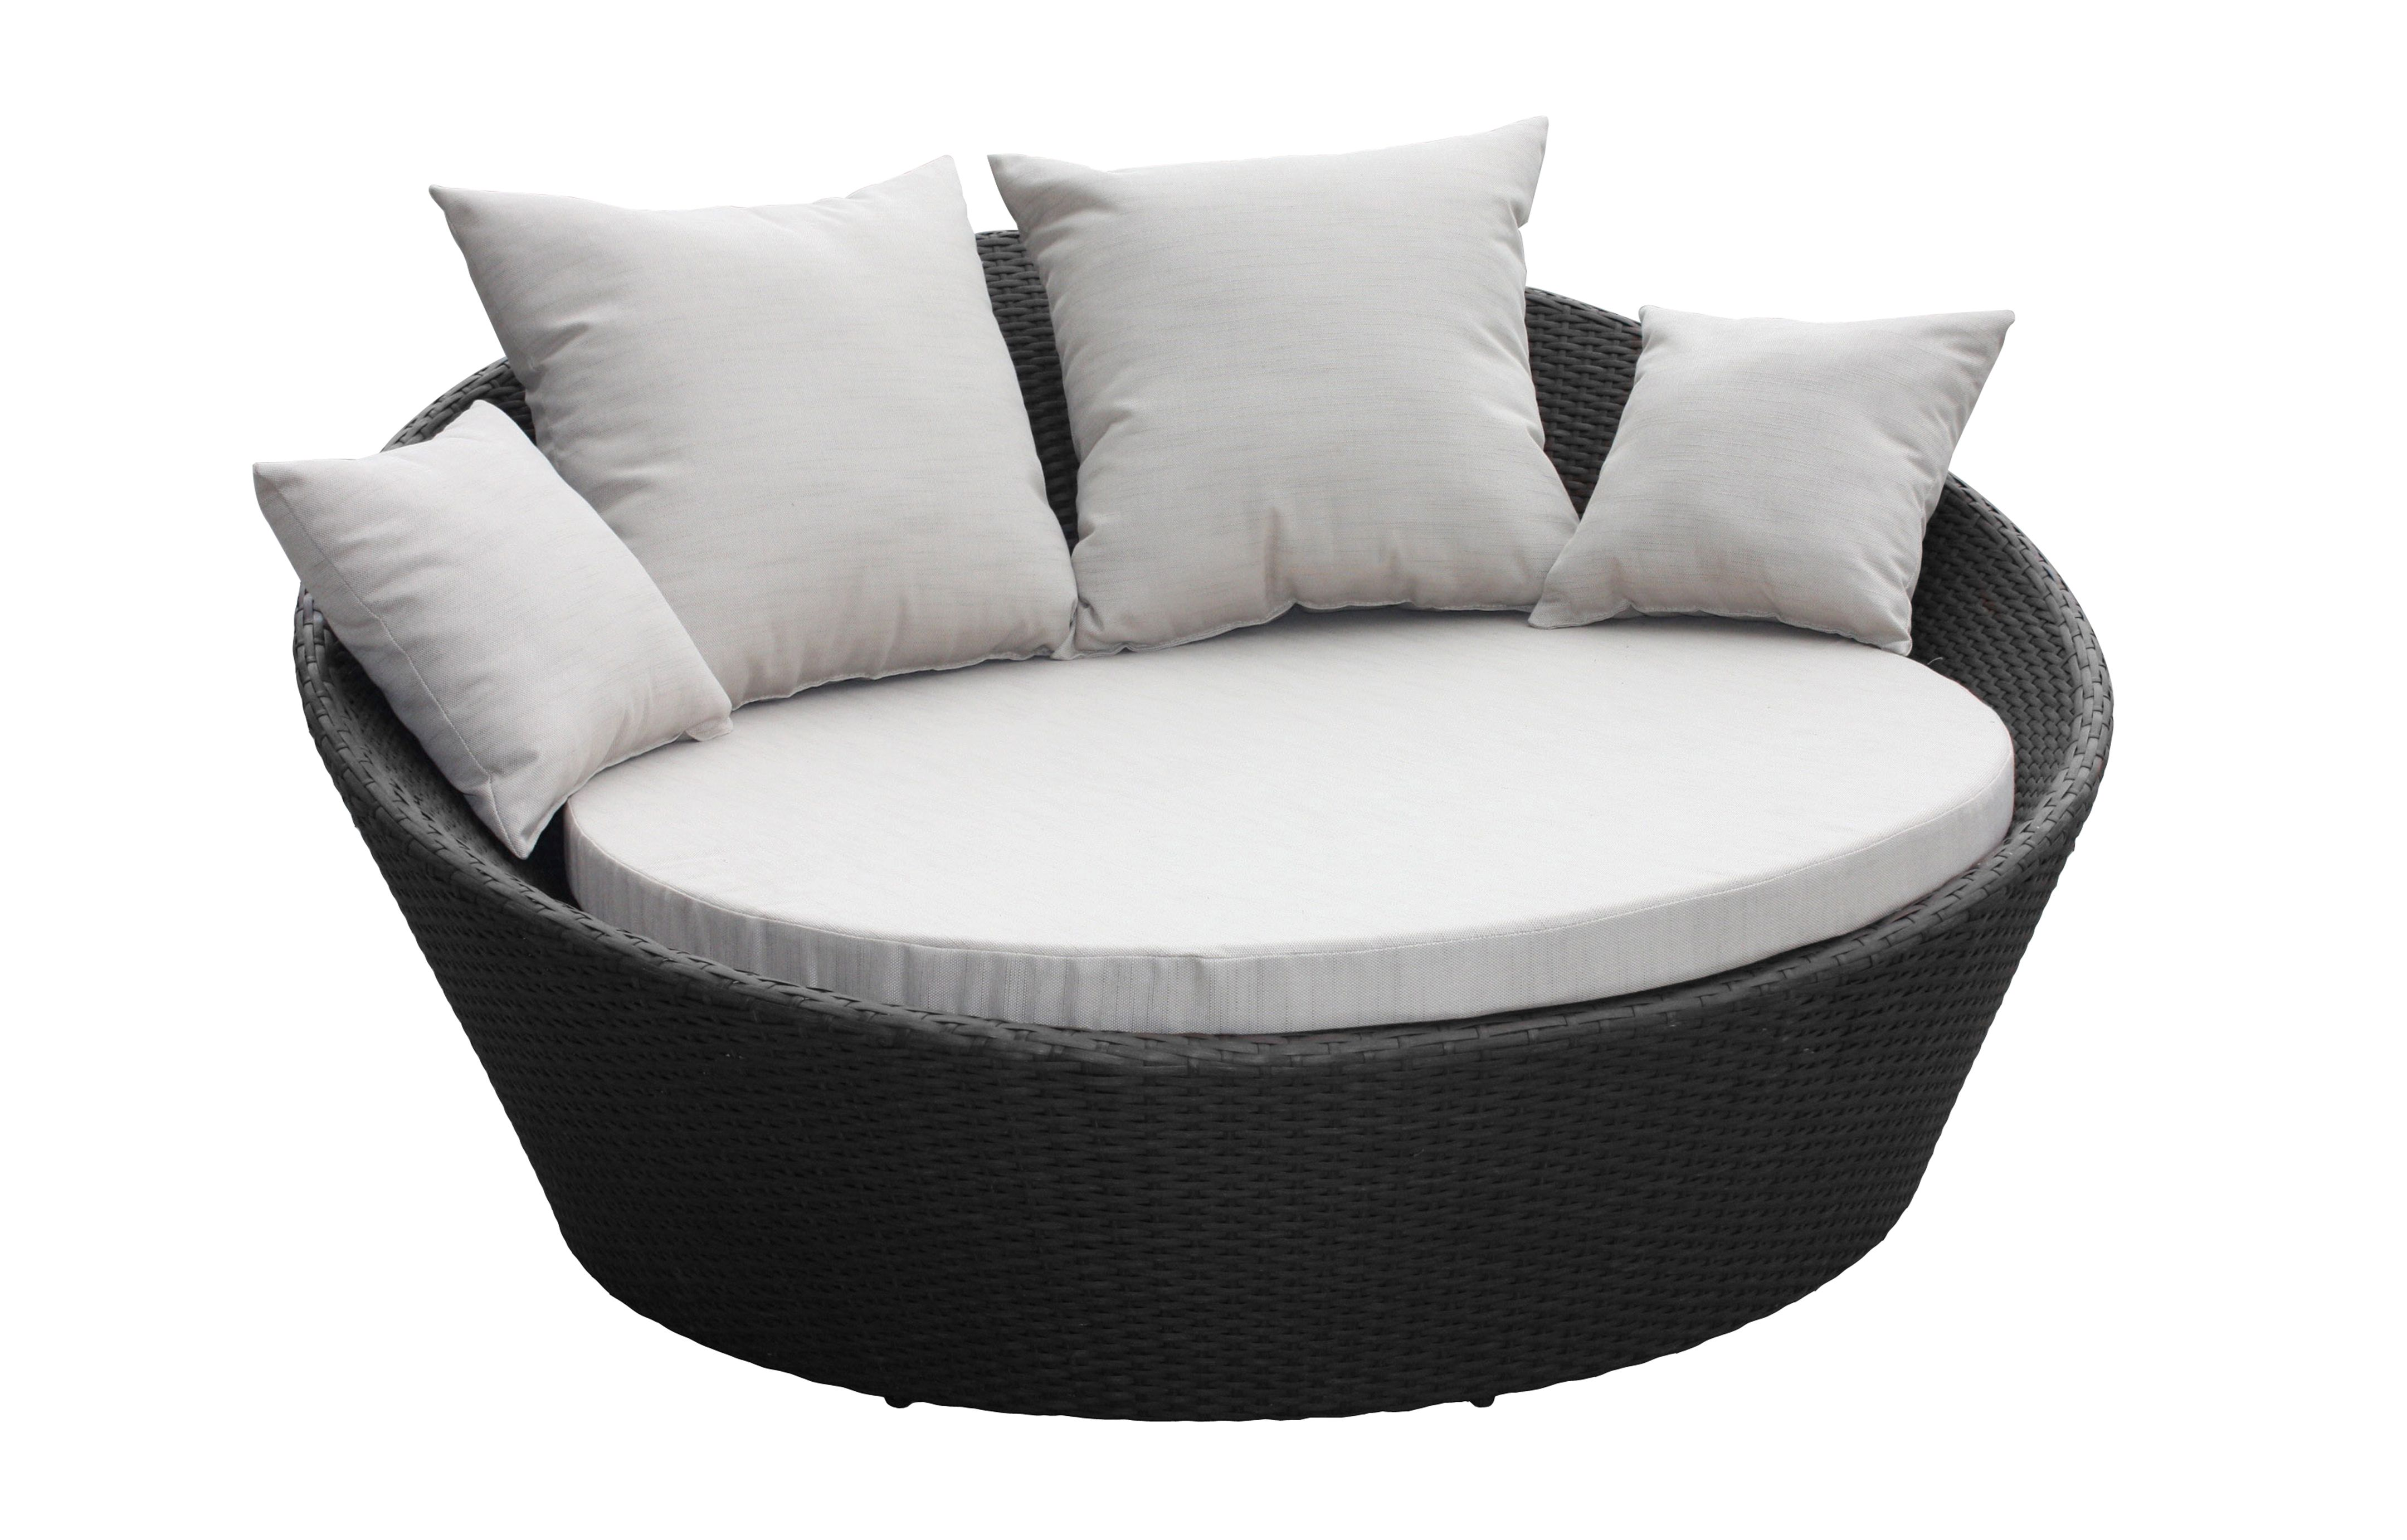 Mimosa denarau day bed with cushions bunnings warehouse